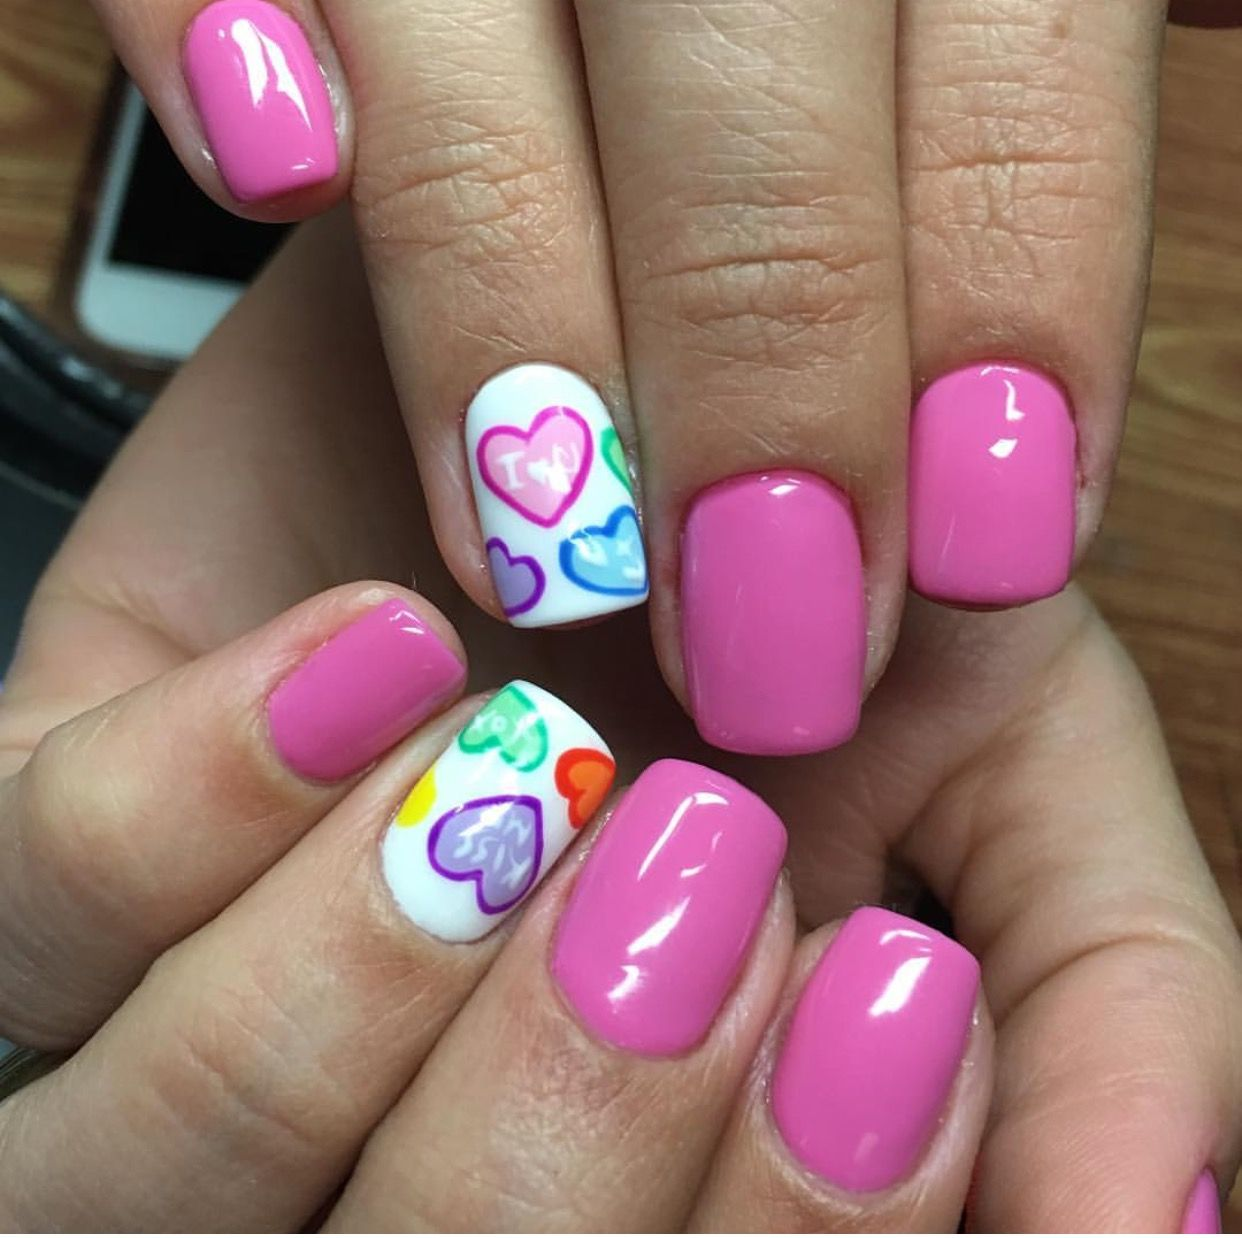 20 amazing valentines day nails looks society19